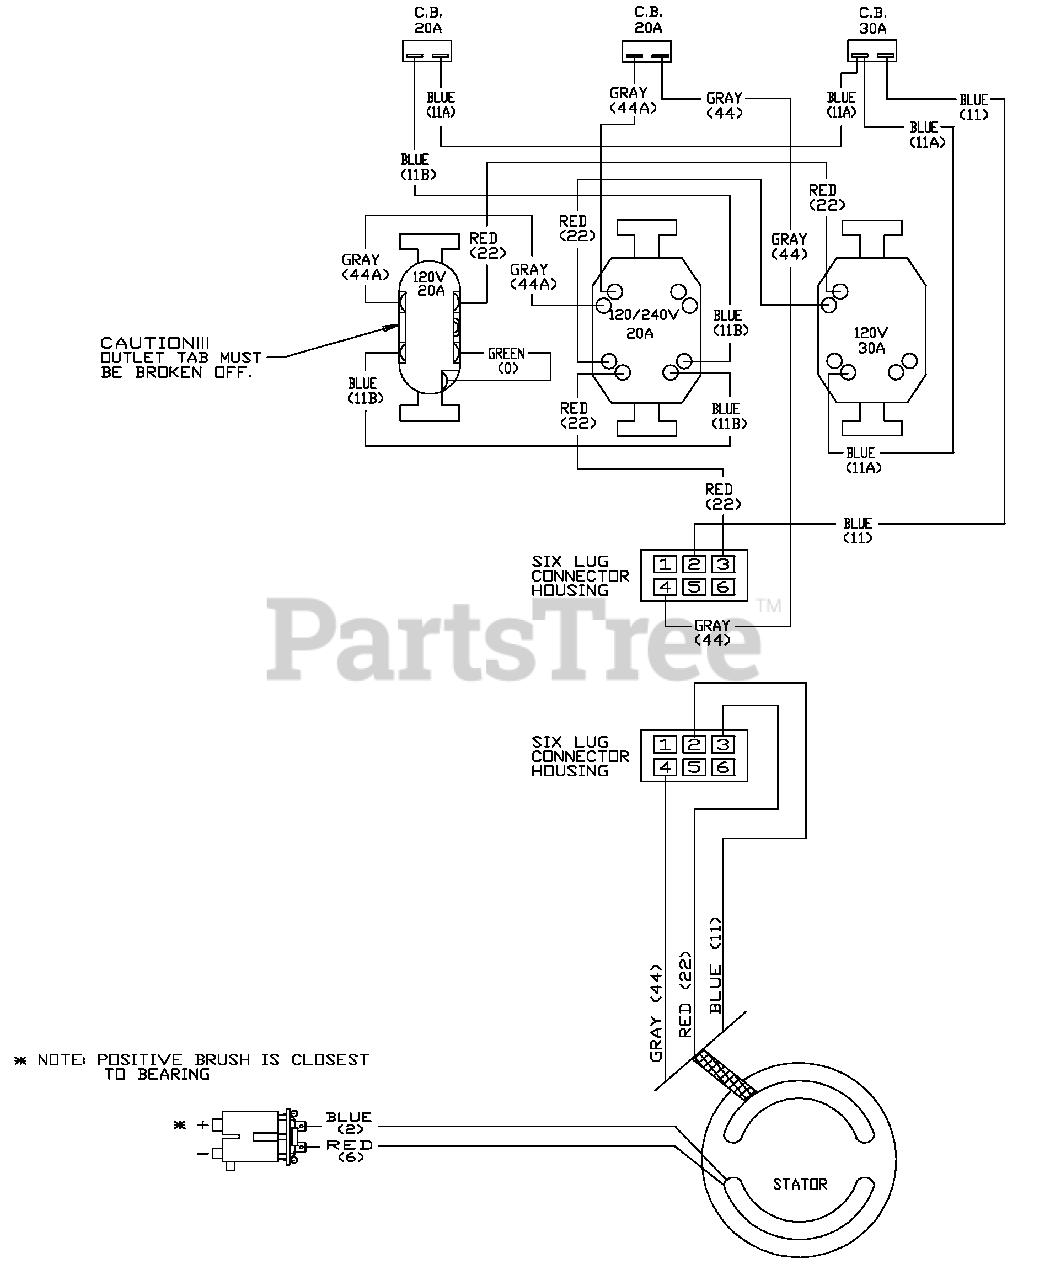 Generac 1669-0 - Generac 5,000 Watt Portable Generator Wiring Diagram Parts  Lookup with Diagrams | PartsTree | Generac 5000 Generator Wiring Diagram |  | PartsTree